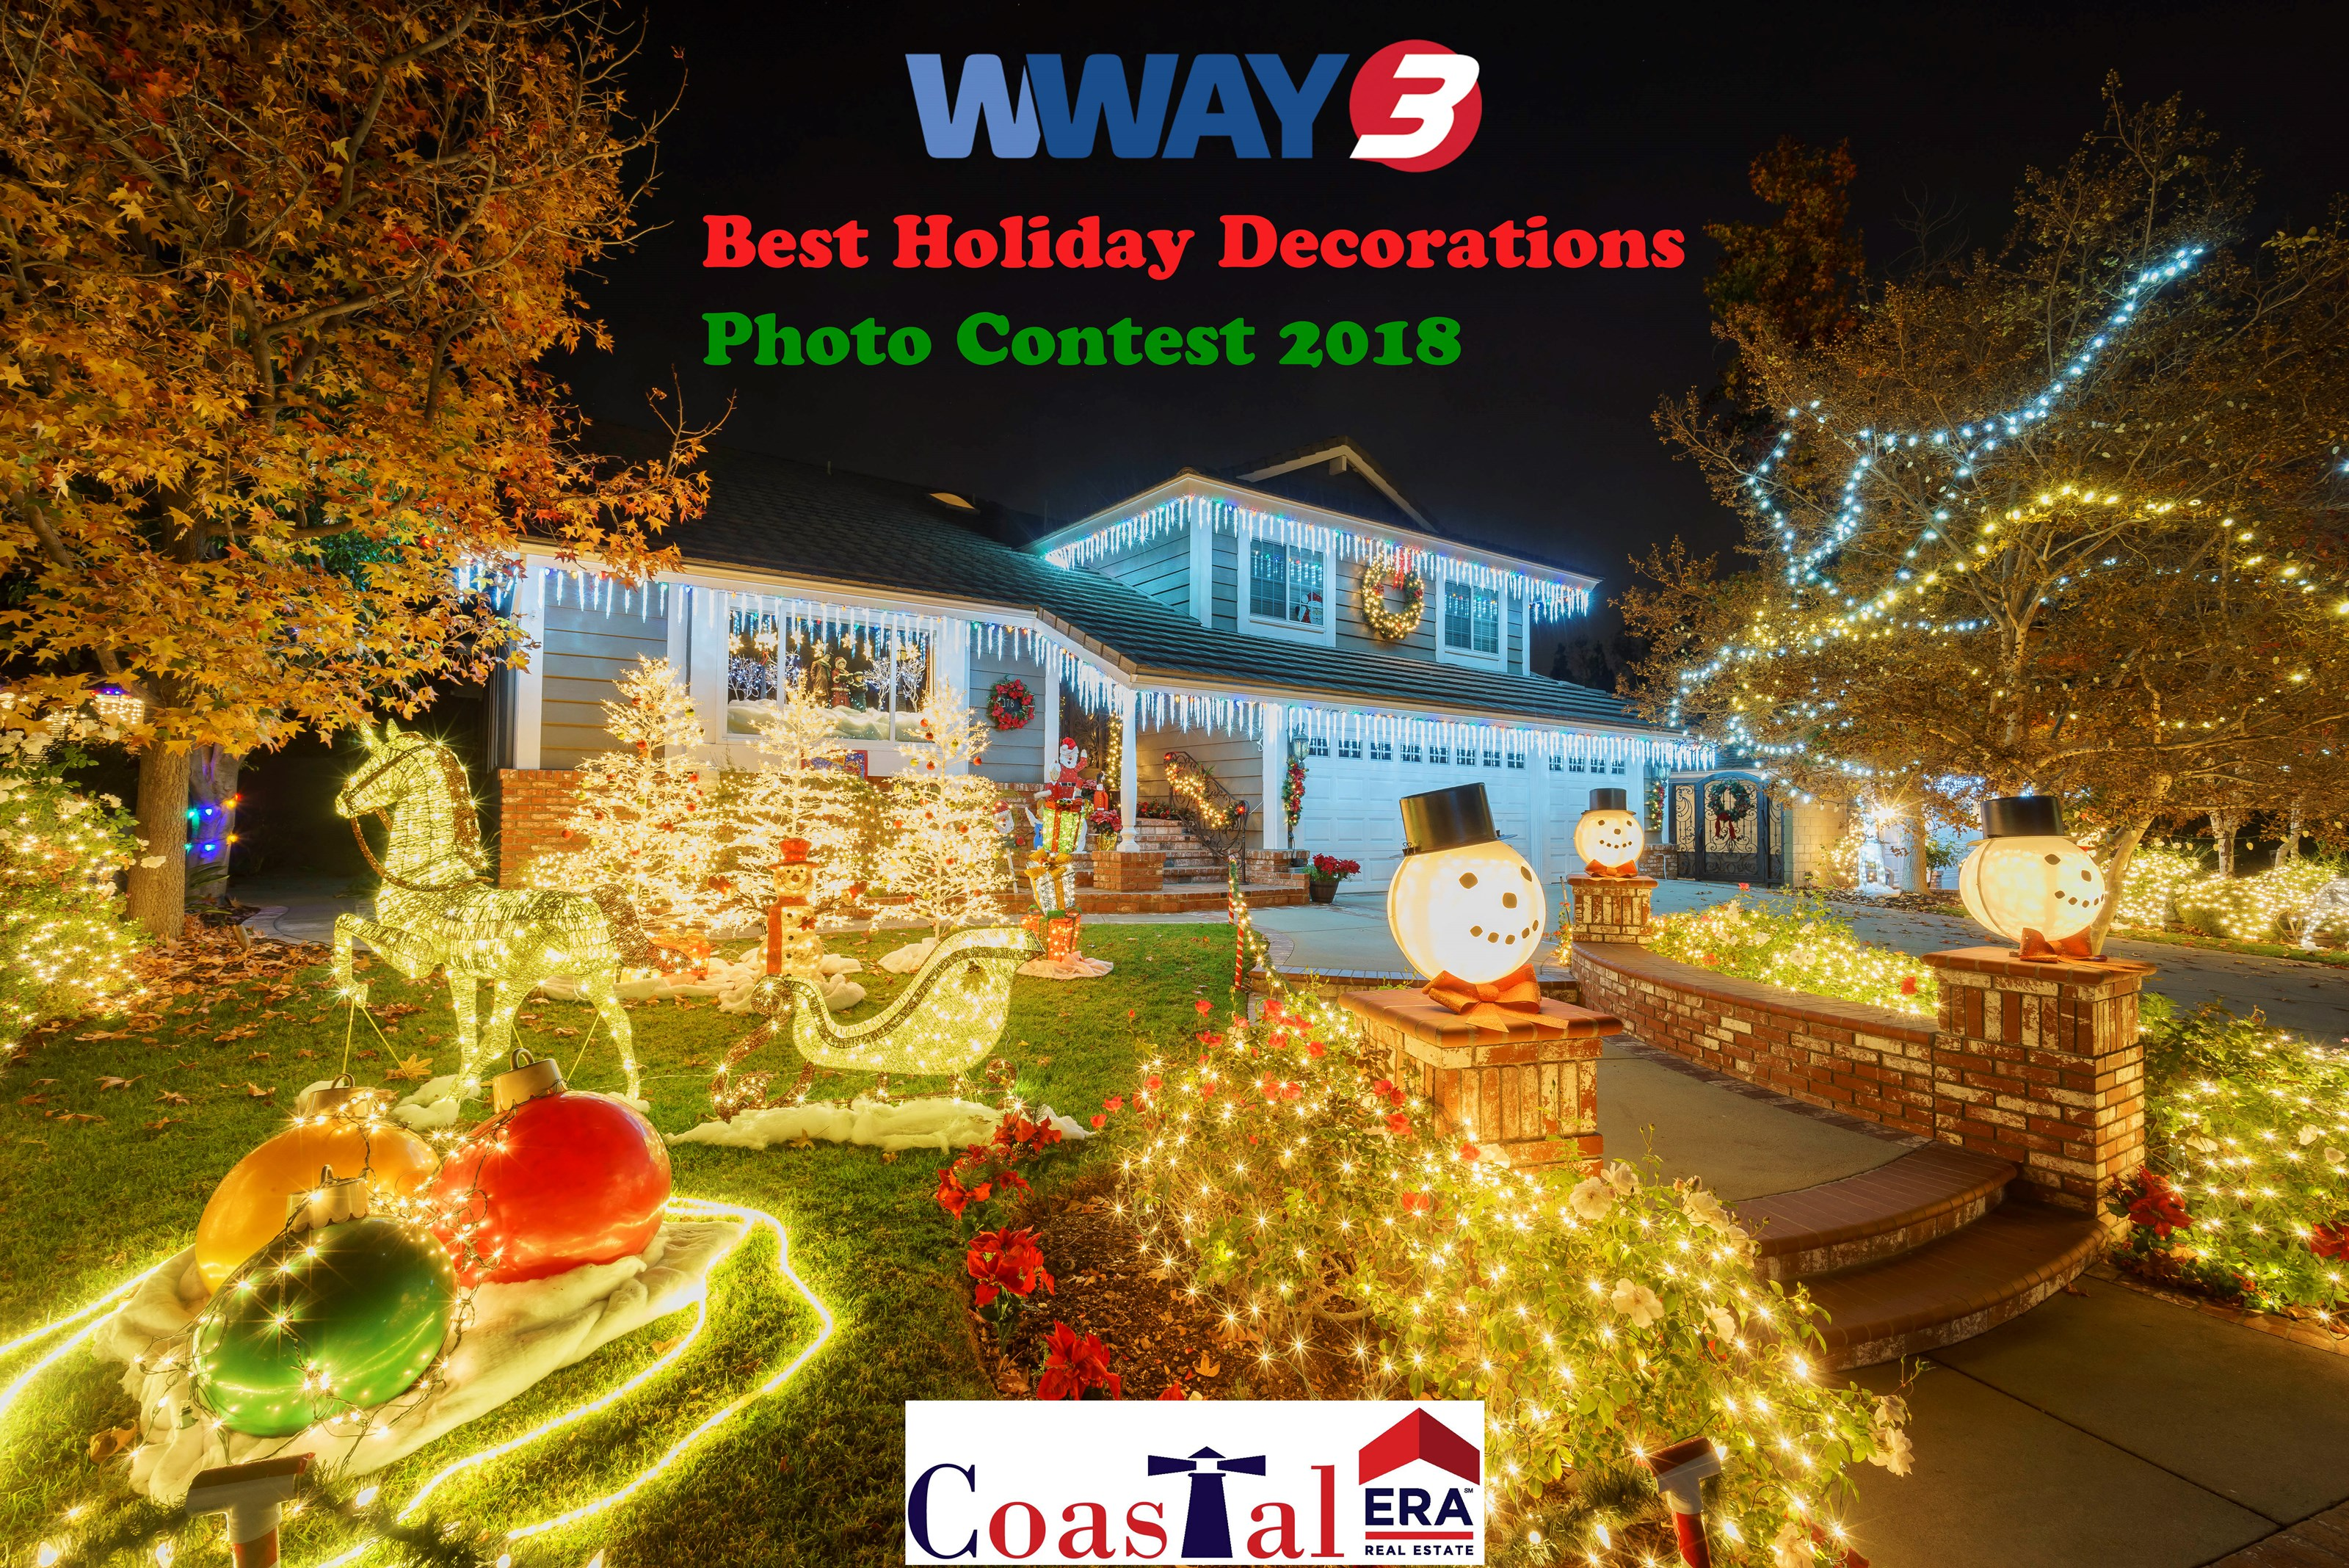 Brazilian Paradise Christmas - WWAY Best Holiday Decorations Photo Contest 2018